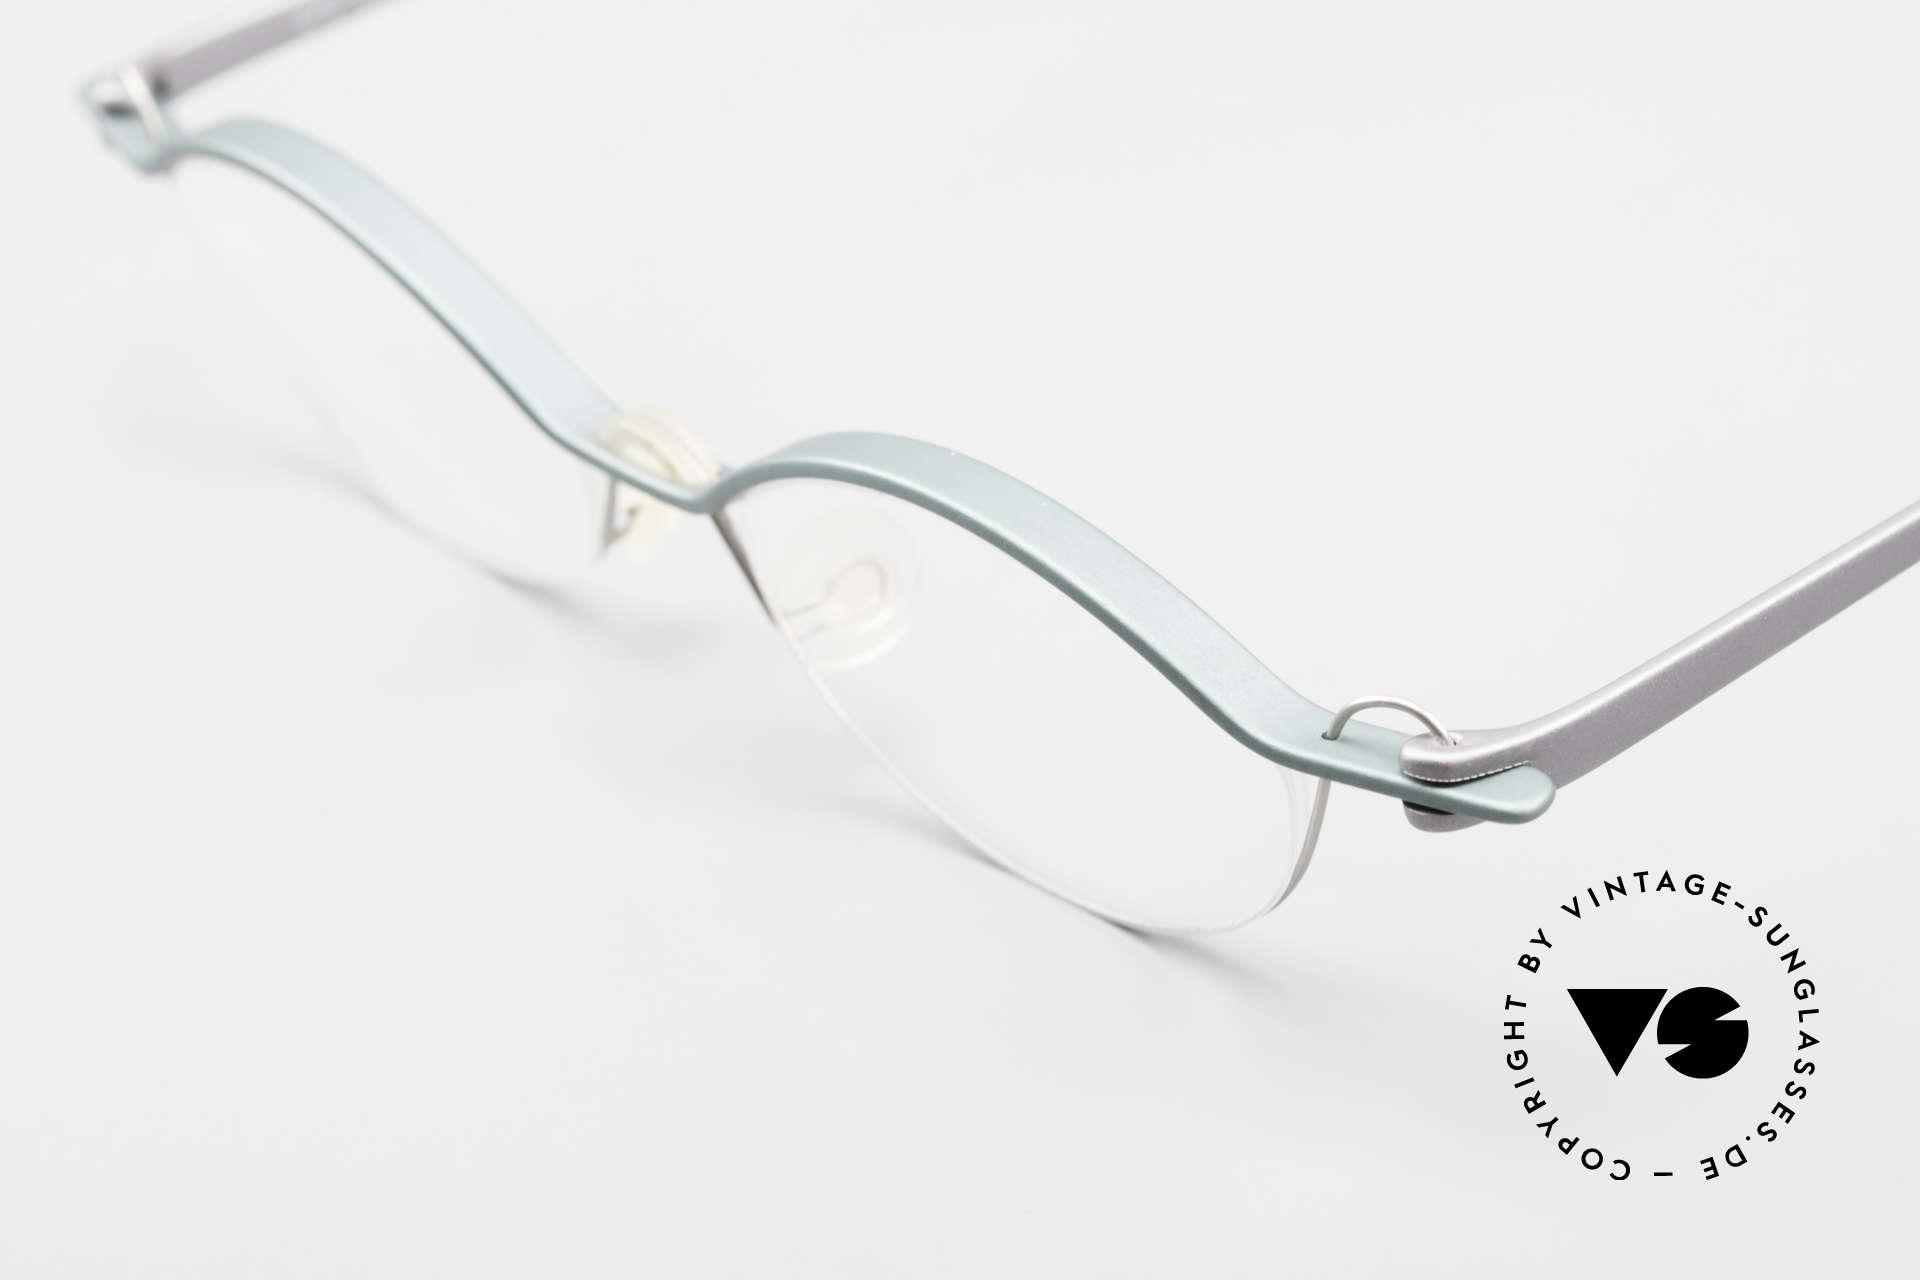 ProDesign No25 Gail Spence Aluminium Frame, distinctively GAIL SPENCE (specs for design lovers), Made for Men and Women